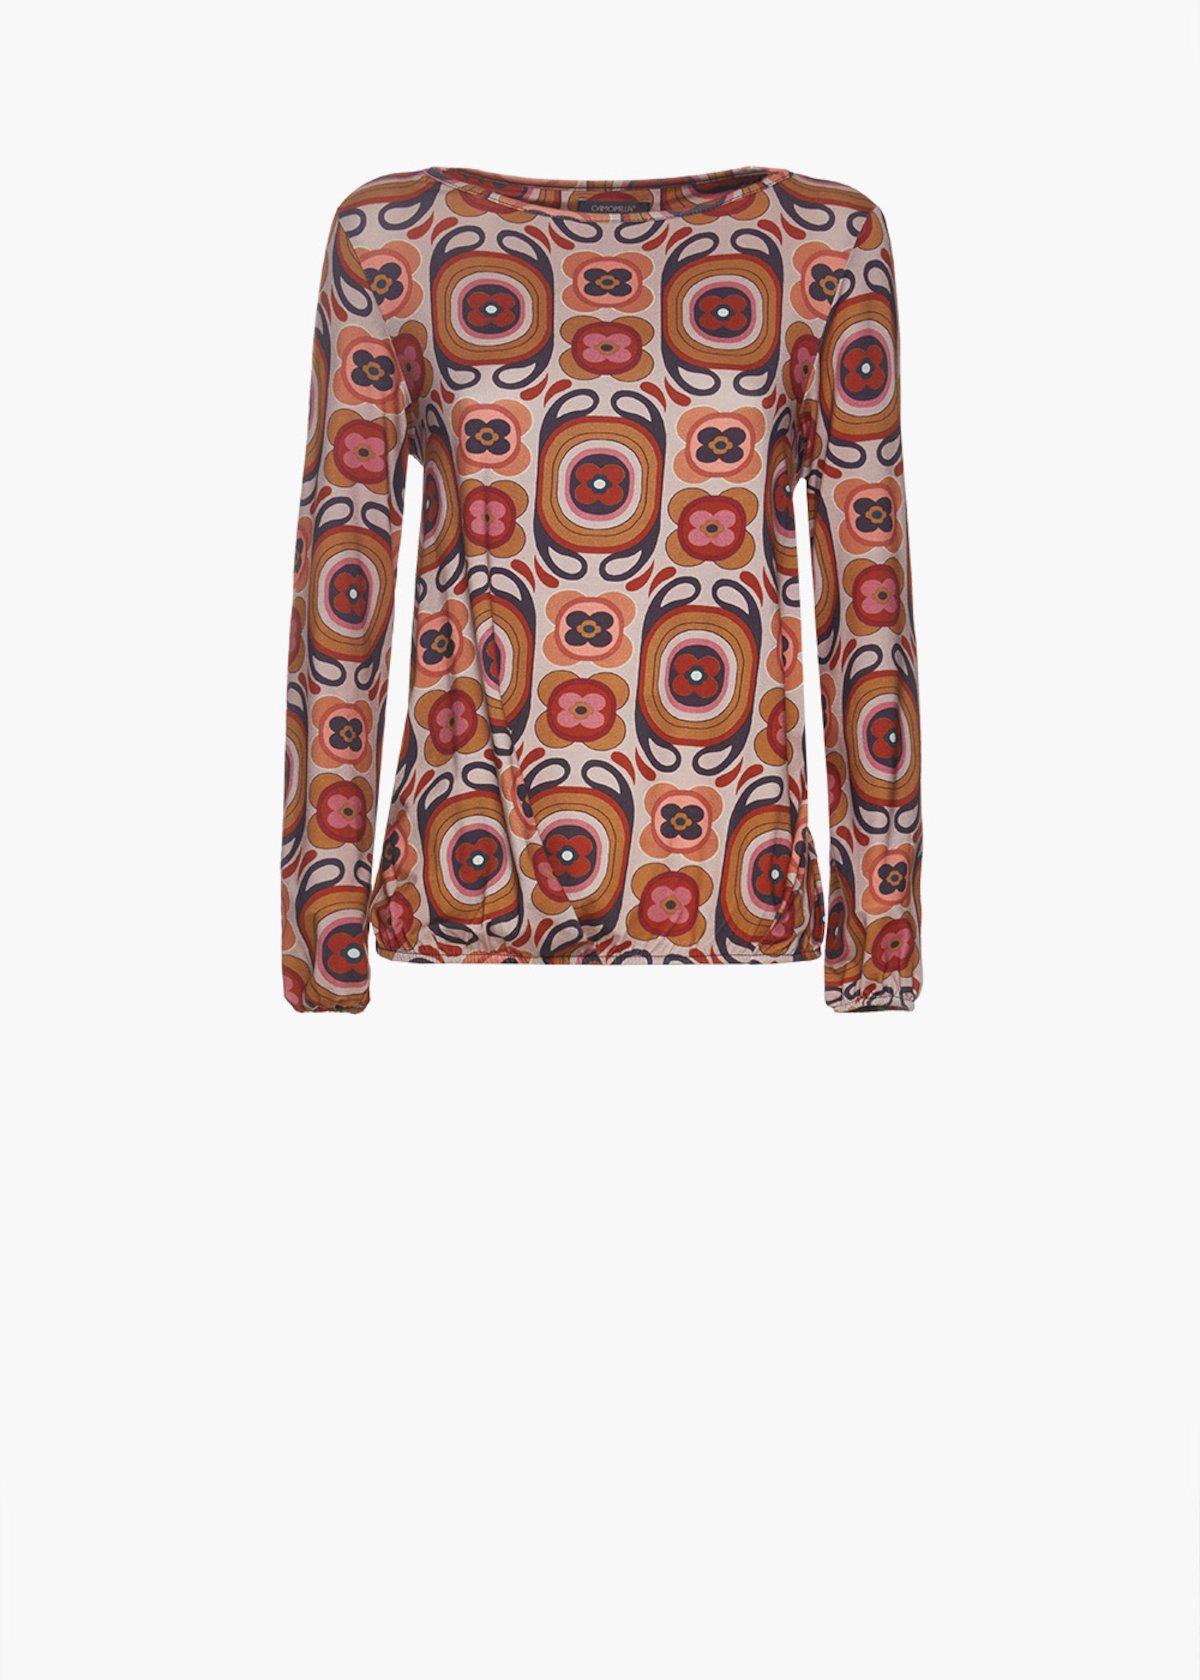 Egg model patterned hippie blouse Soleil - Beige / Carota Fantasia - Woman